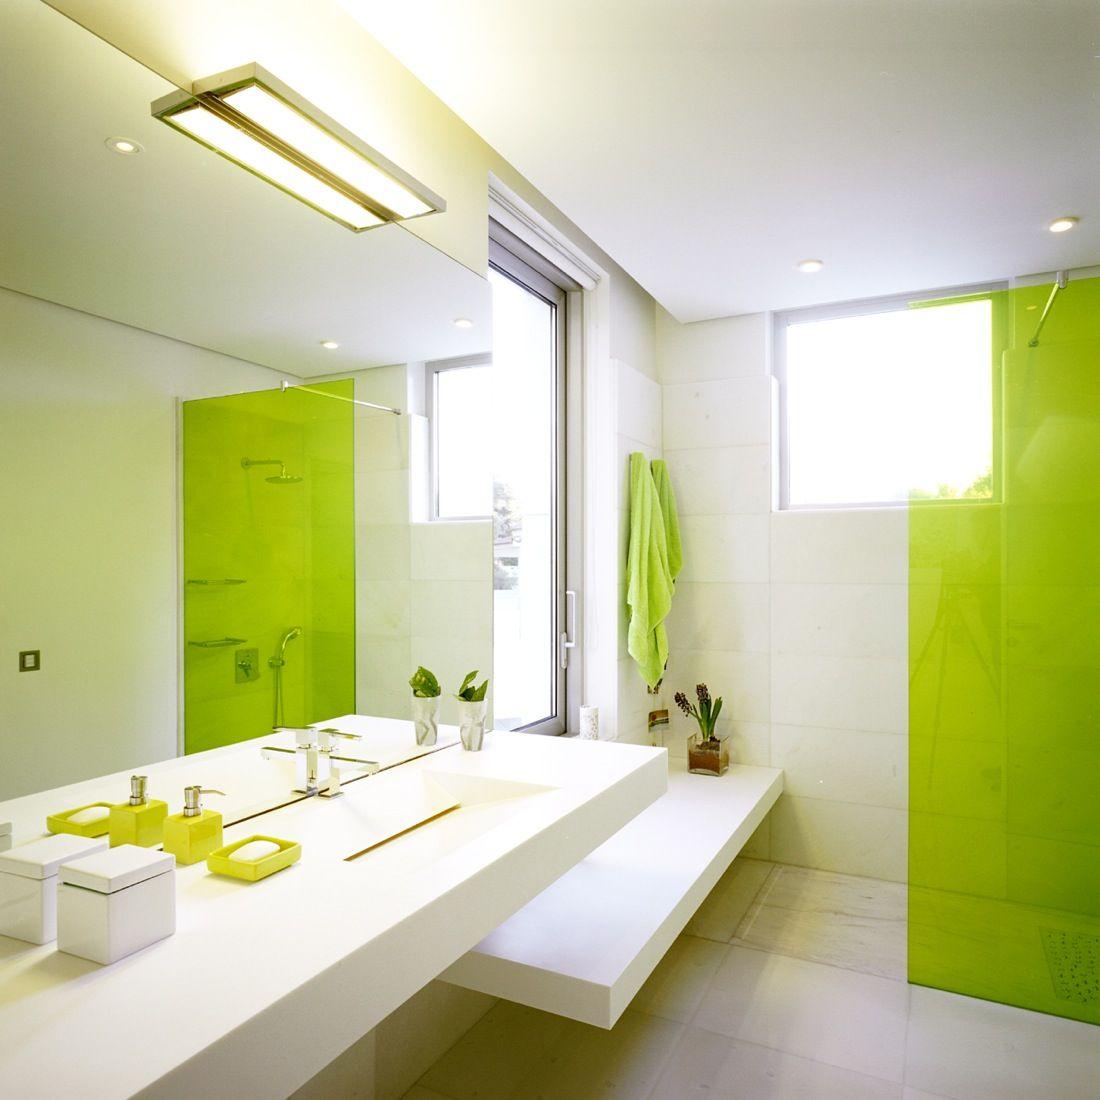 Renew Your Small Bathroom With Modern Decor In Green! | Bathroom ...